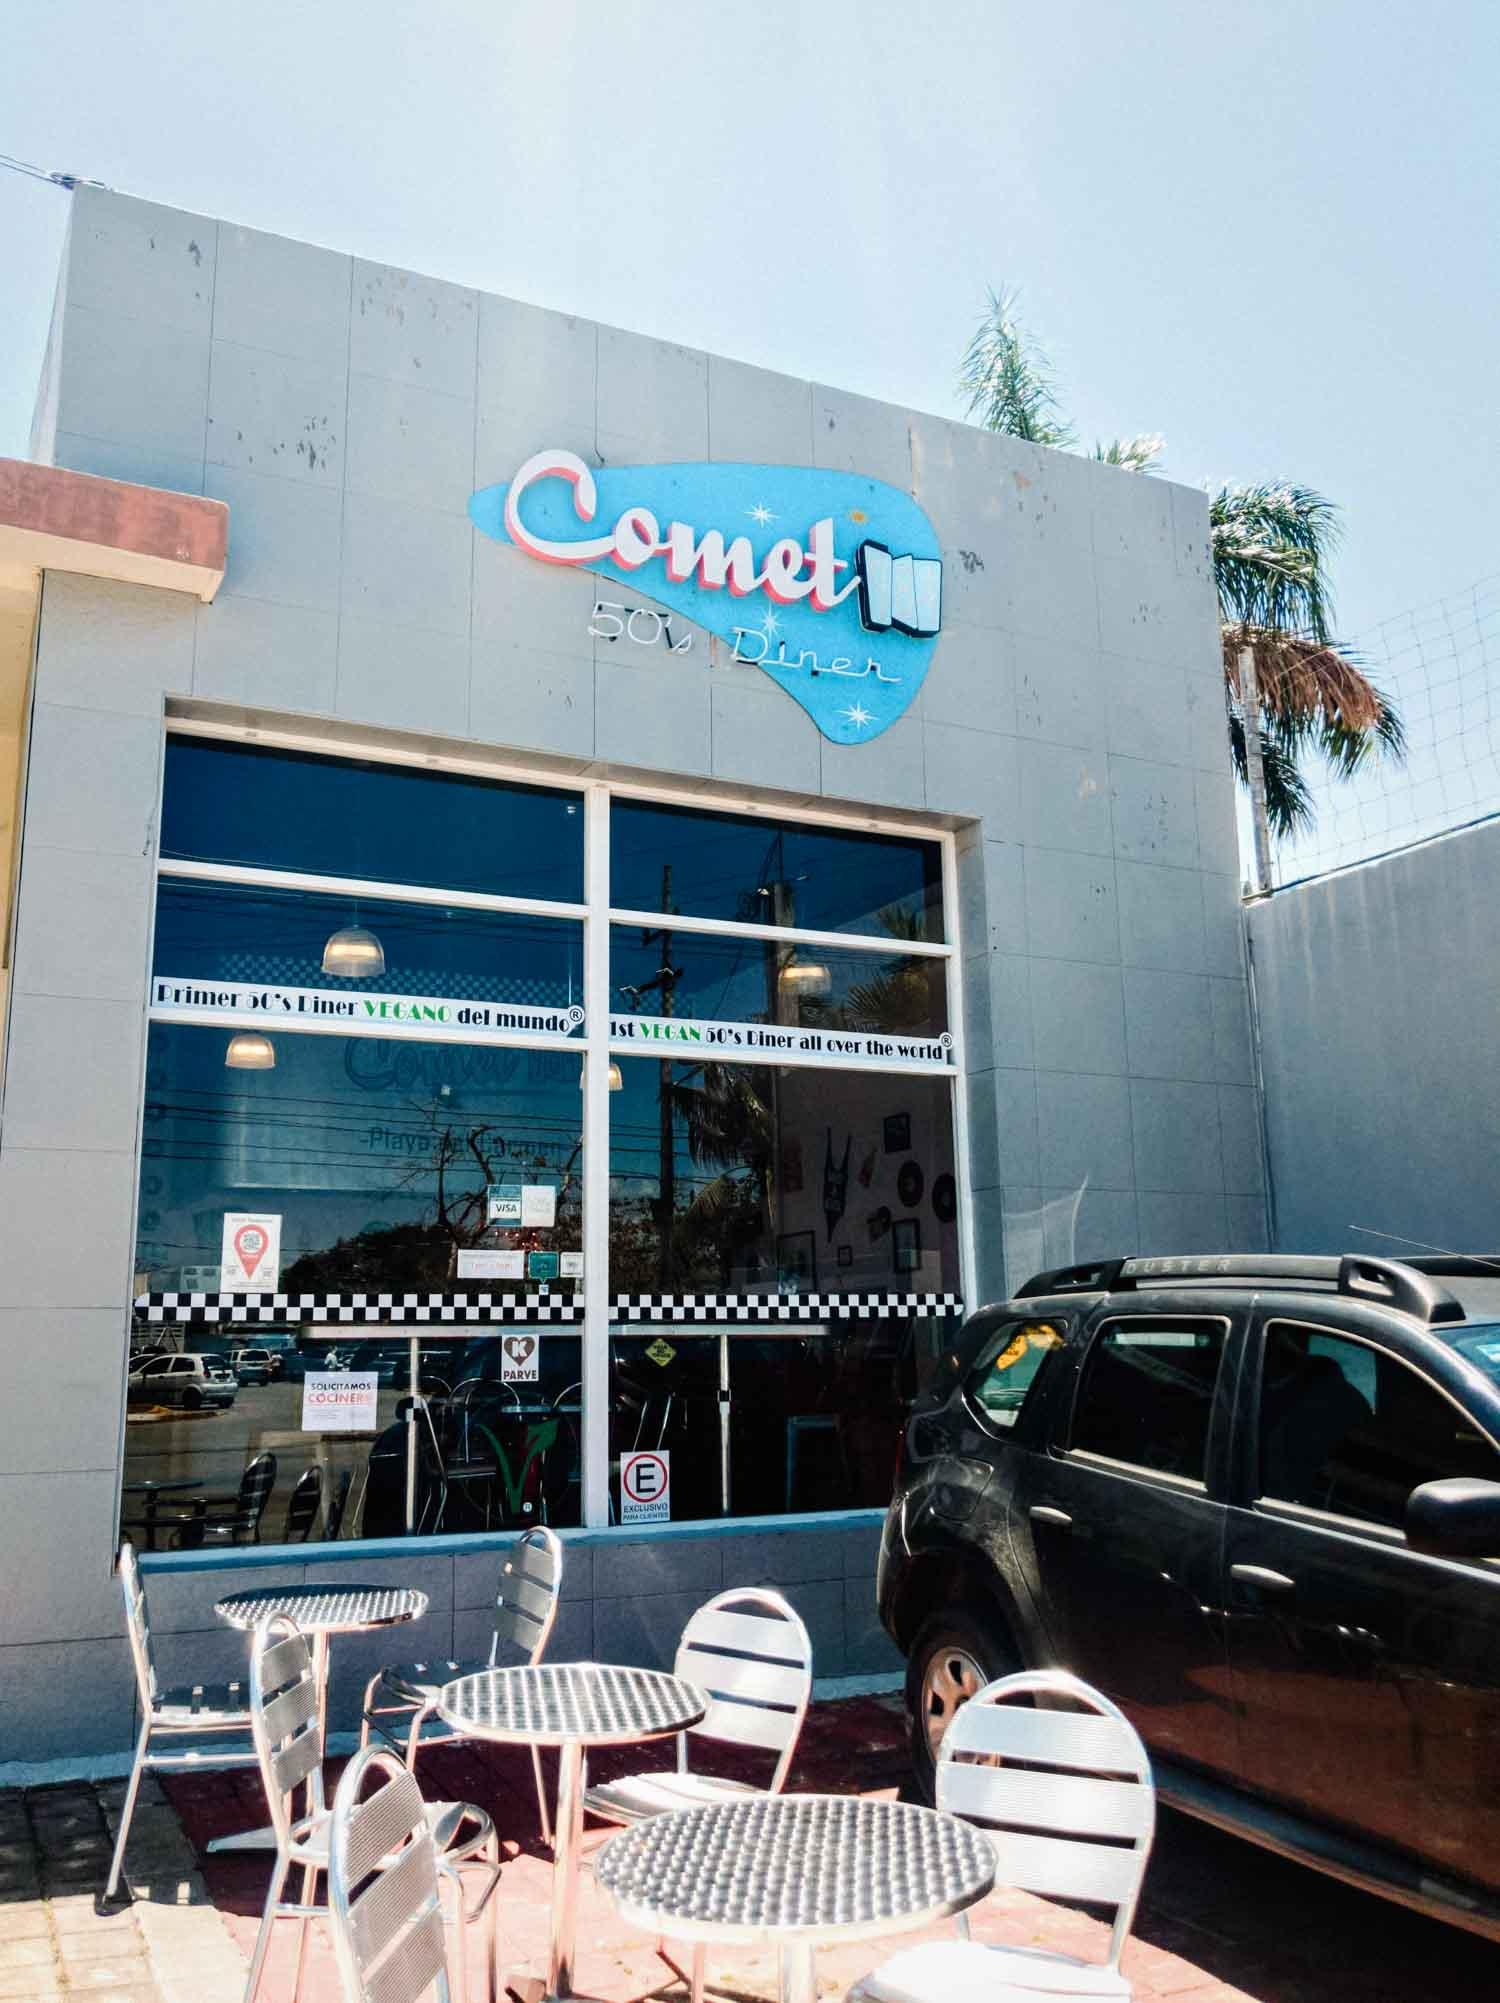 Comet diner vegan restaurant in Playa del Carmen.